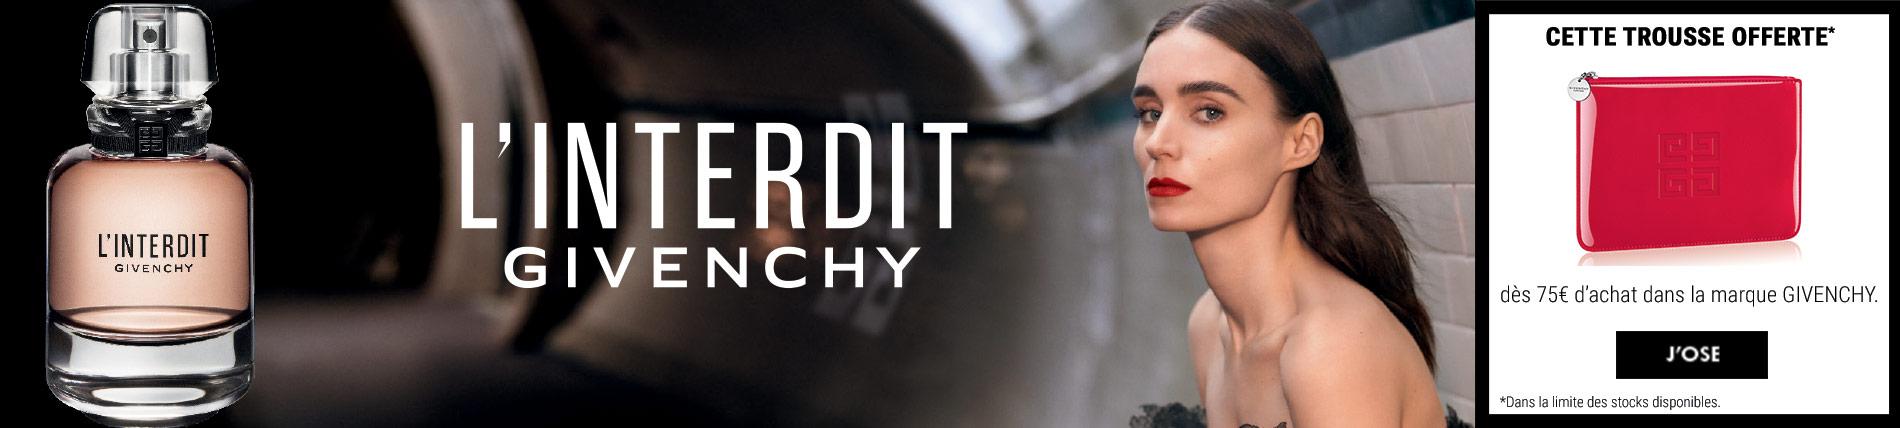 L'Interdit Givenchy